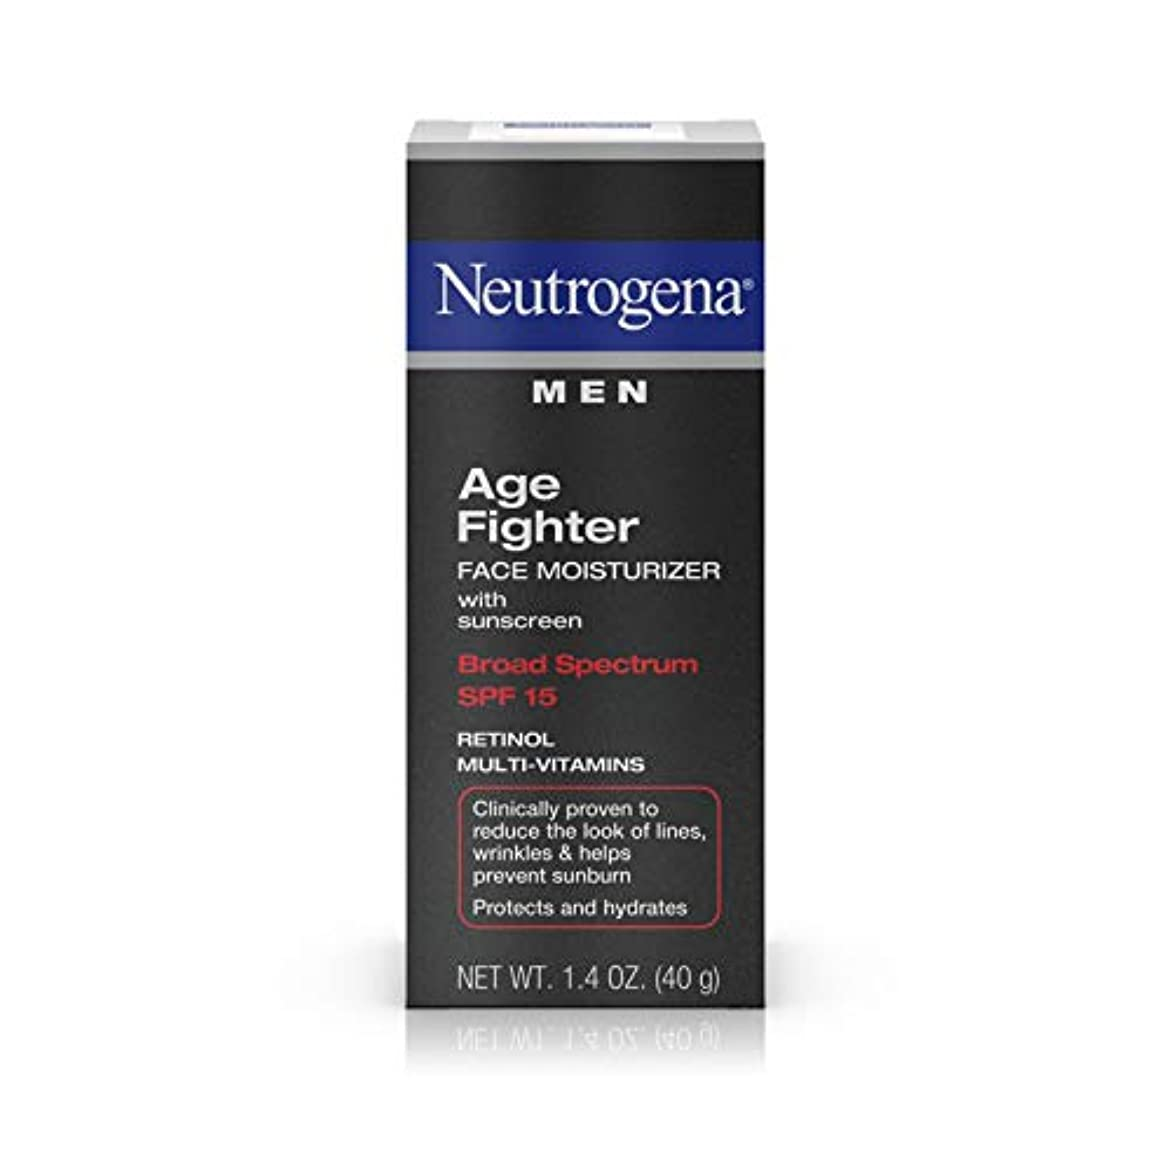 Neutrogena Men Age Fighter Face Moisturizer with sunscreen SPF 15 1.4oz.(40g) 男性用ニュートロジーナ メン エイジ ファイター フェイス モイスチャライザー